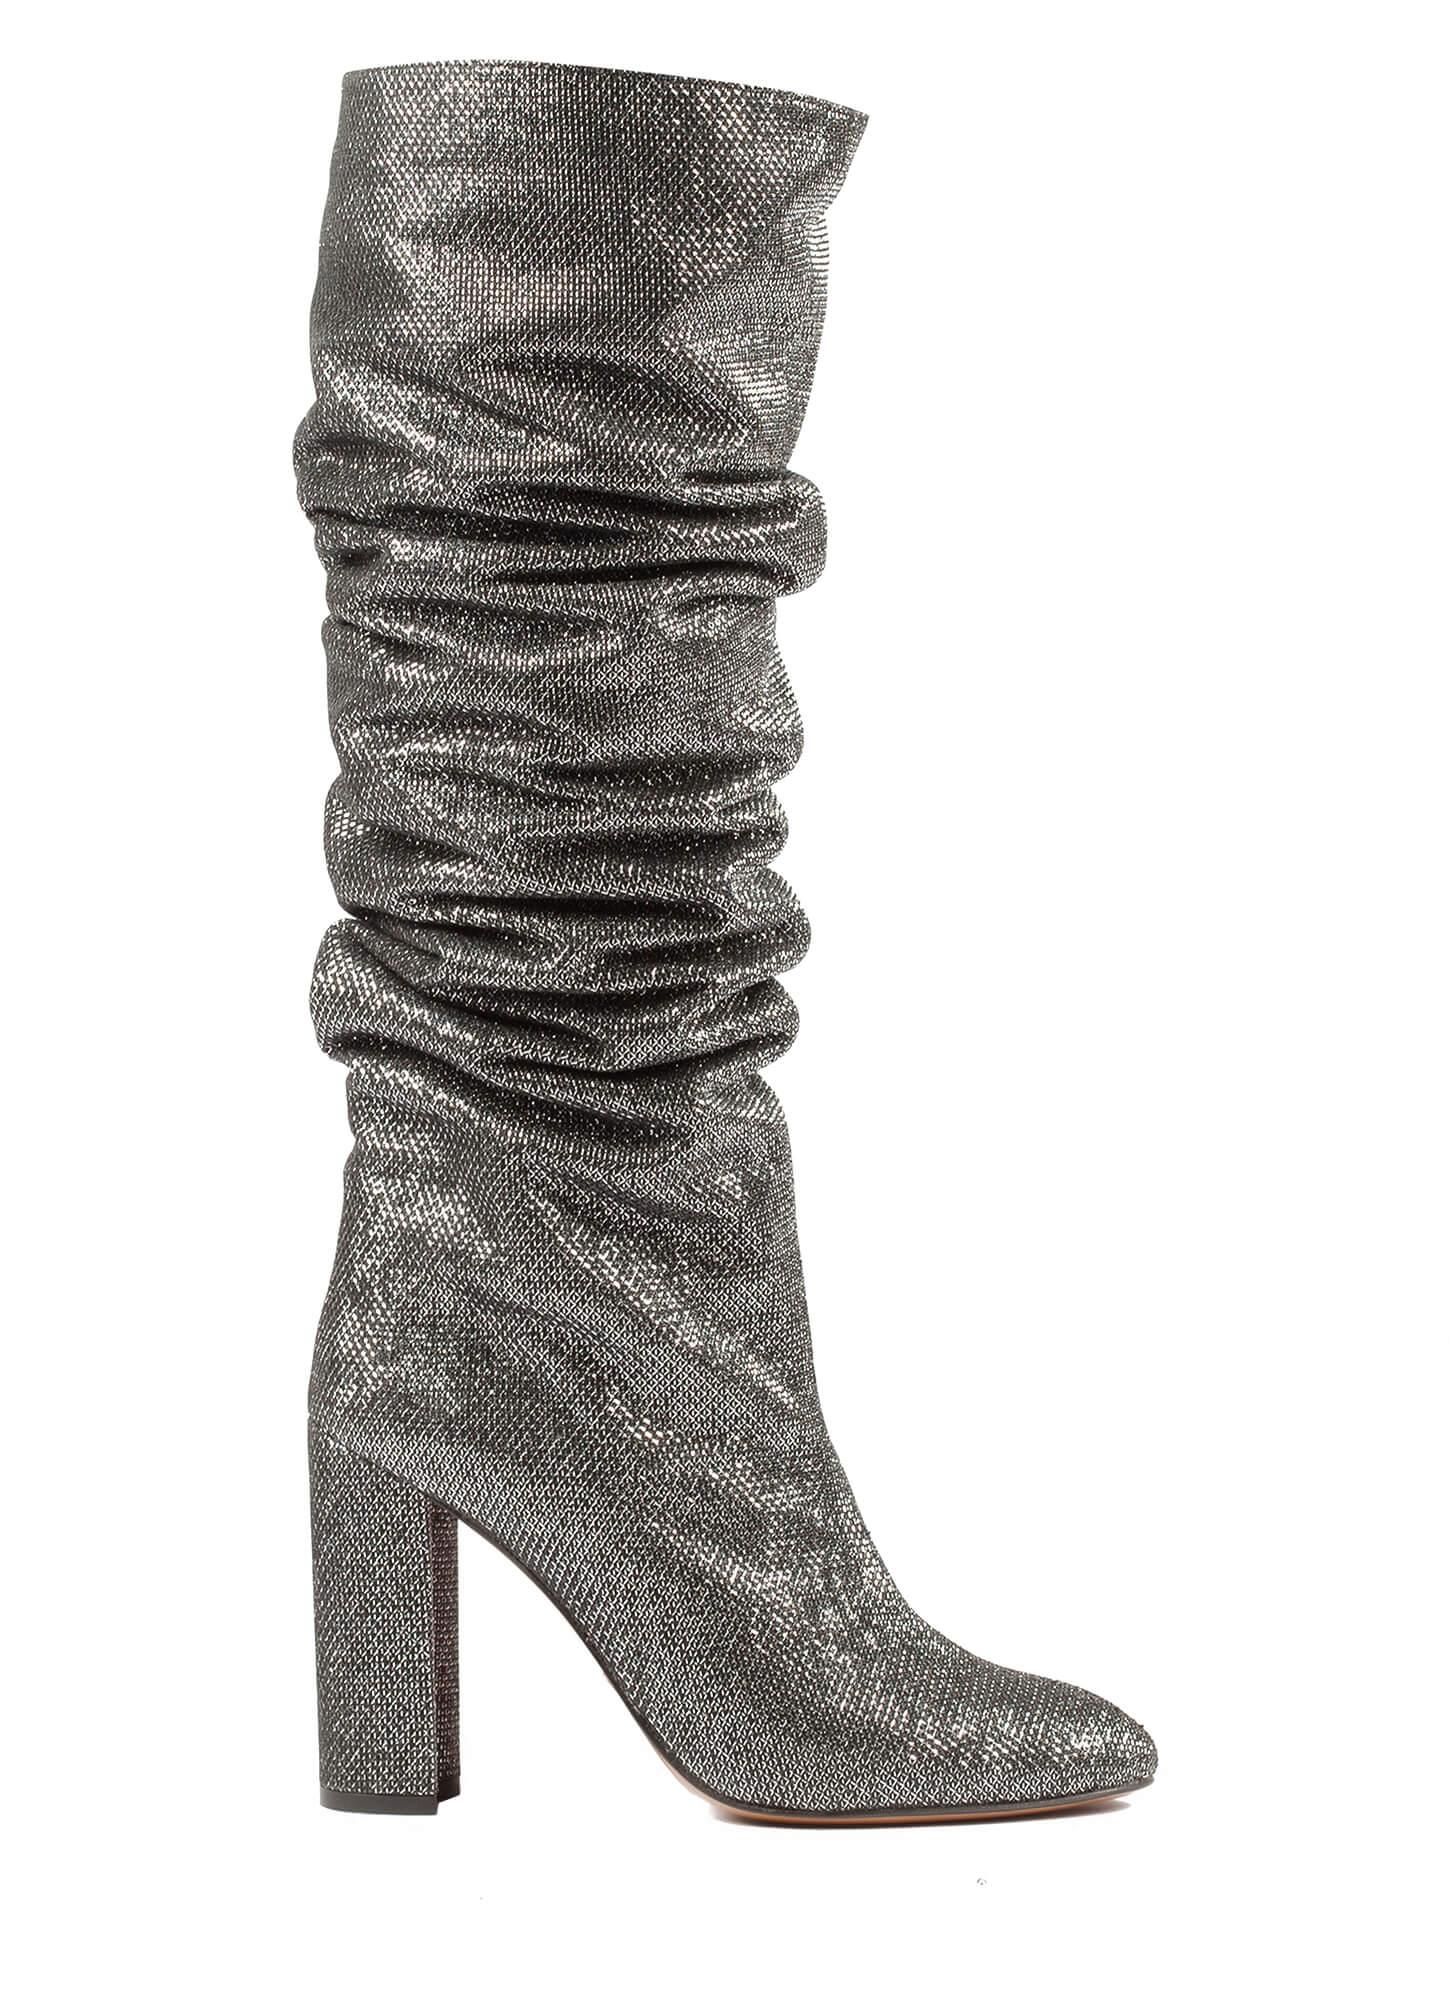 Silver high block heel slouchy boots . PURA LOPEZ